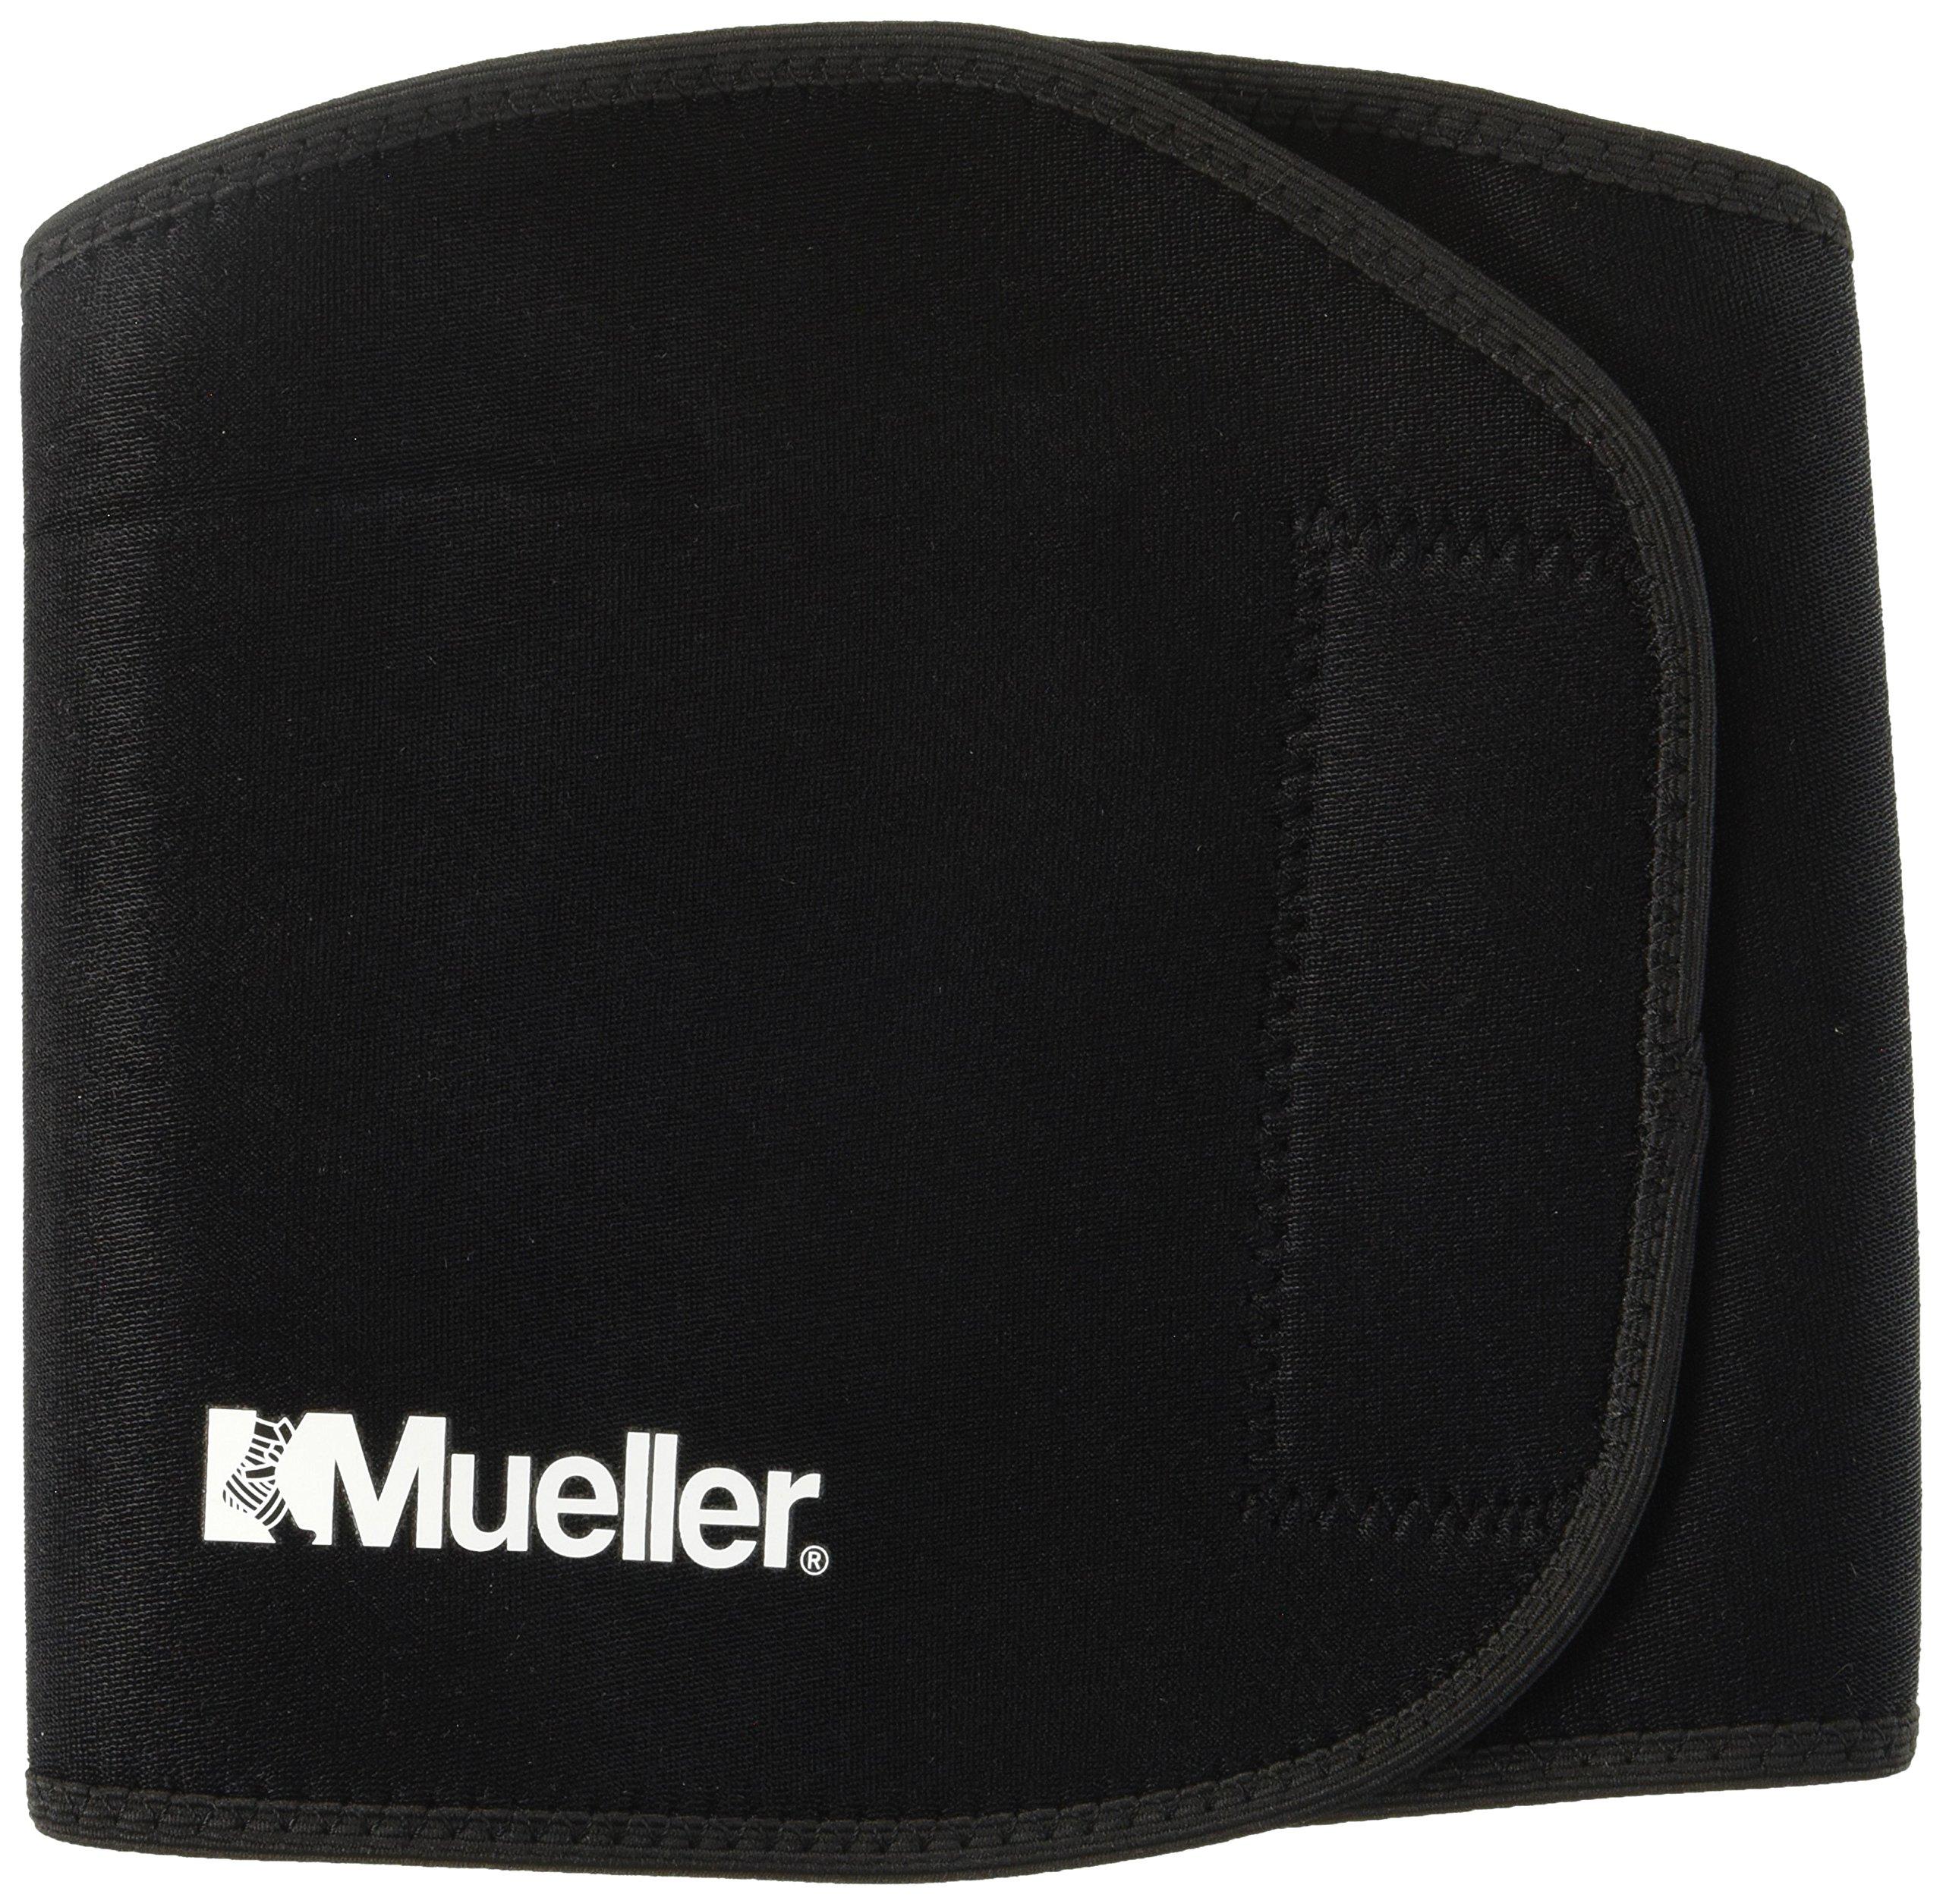 Mueller Neoprene Thigh Support